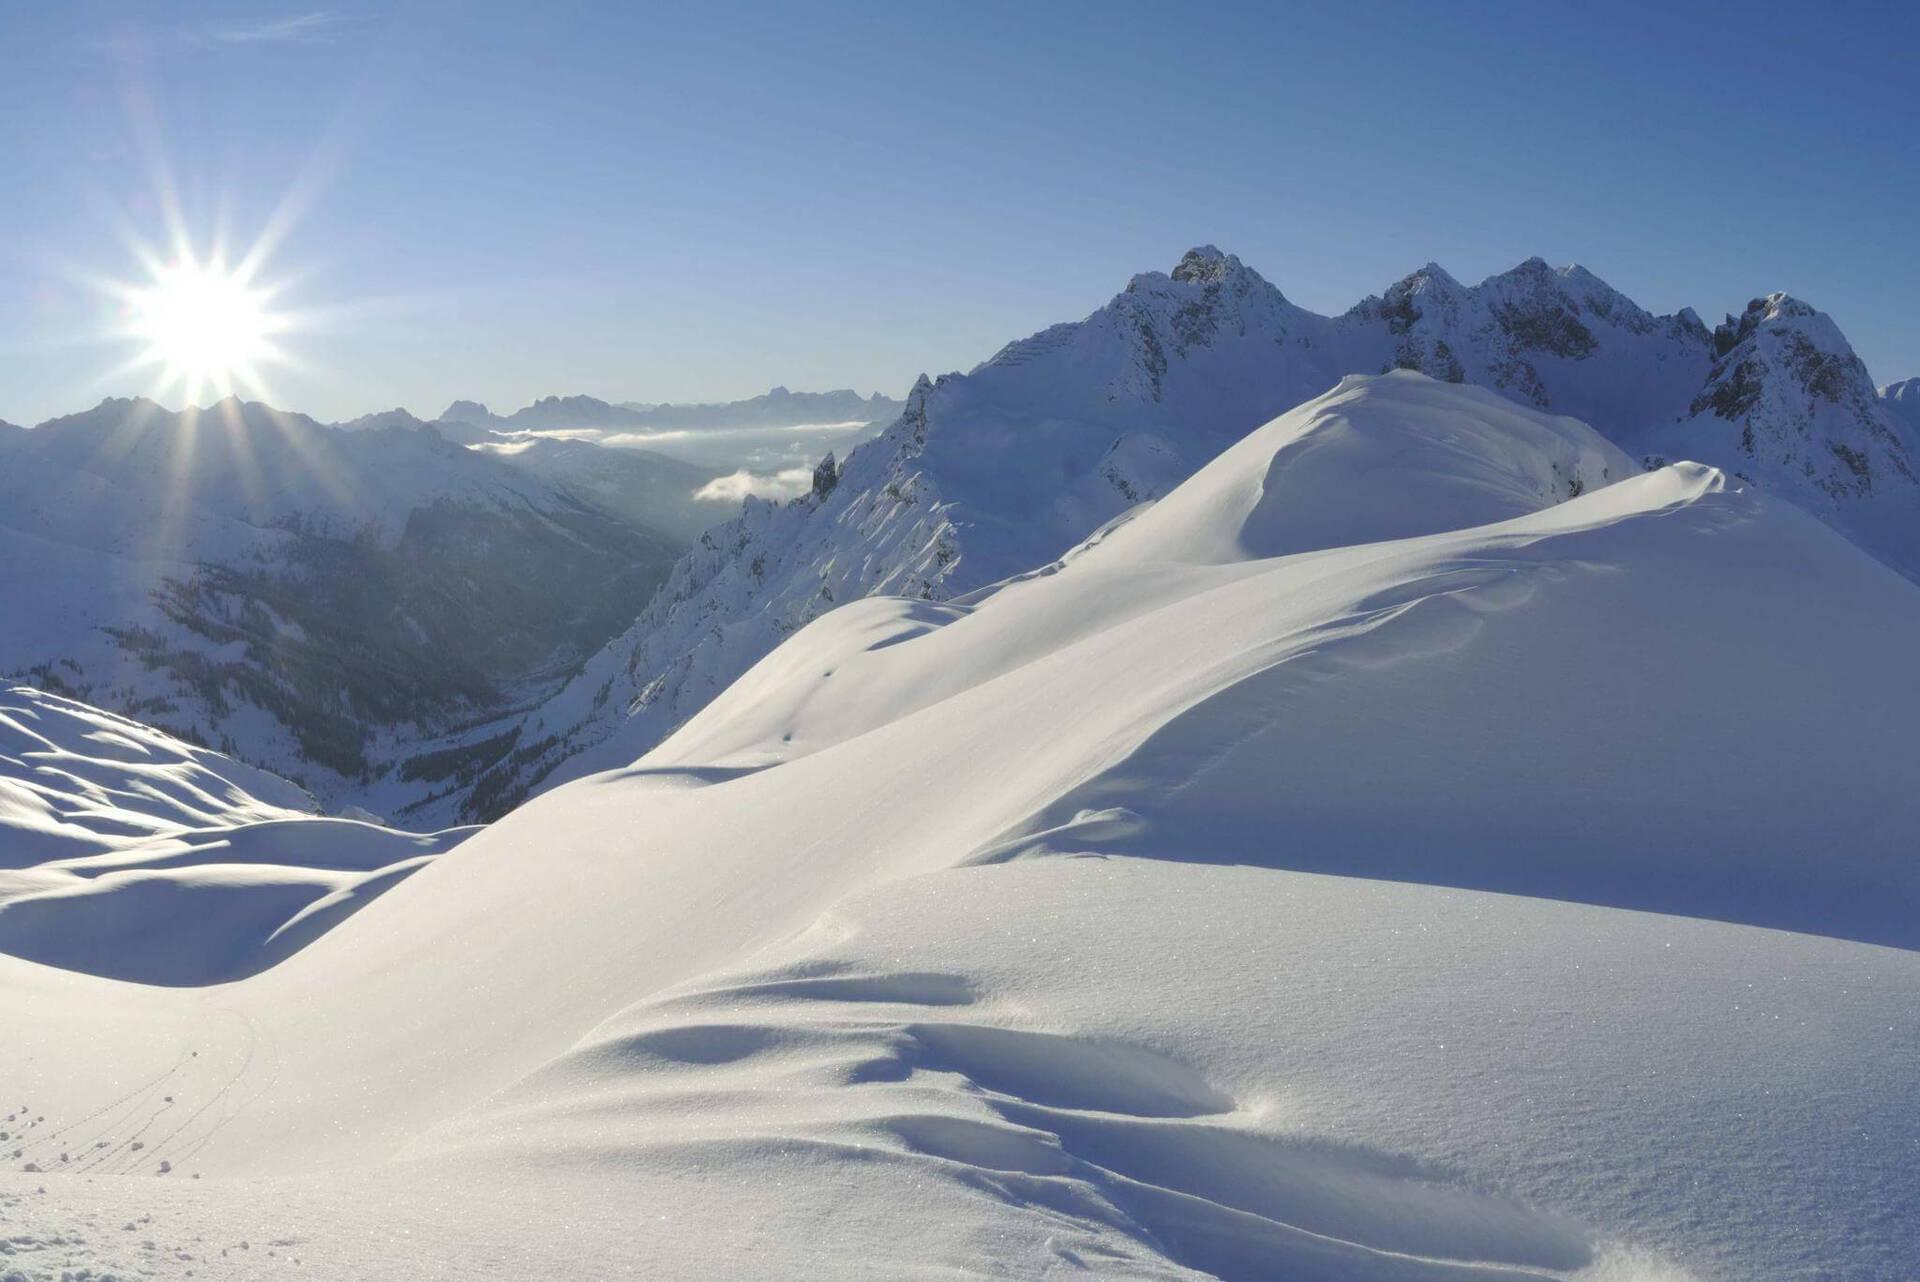 Schnee Sonne Berge